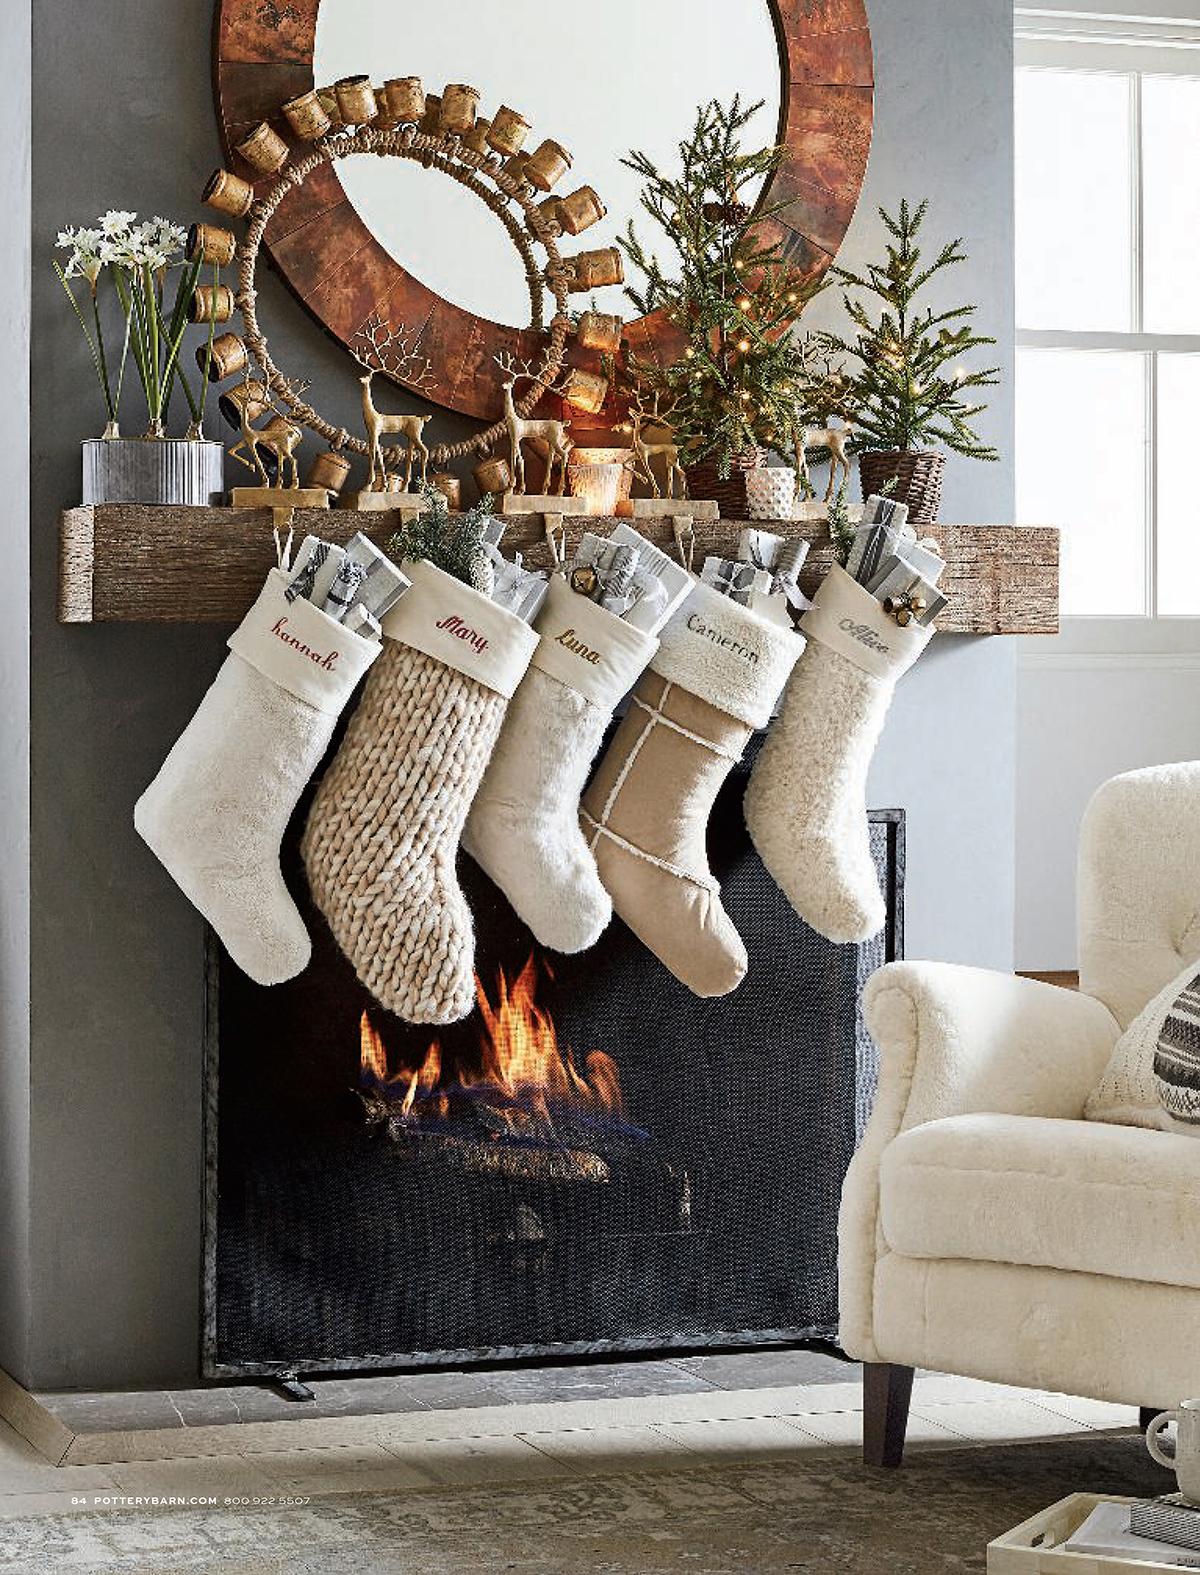 Cozy Knit Stockings